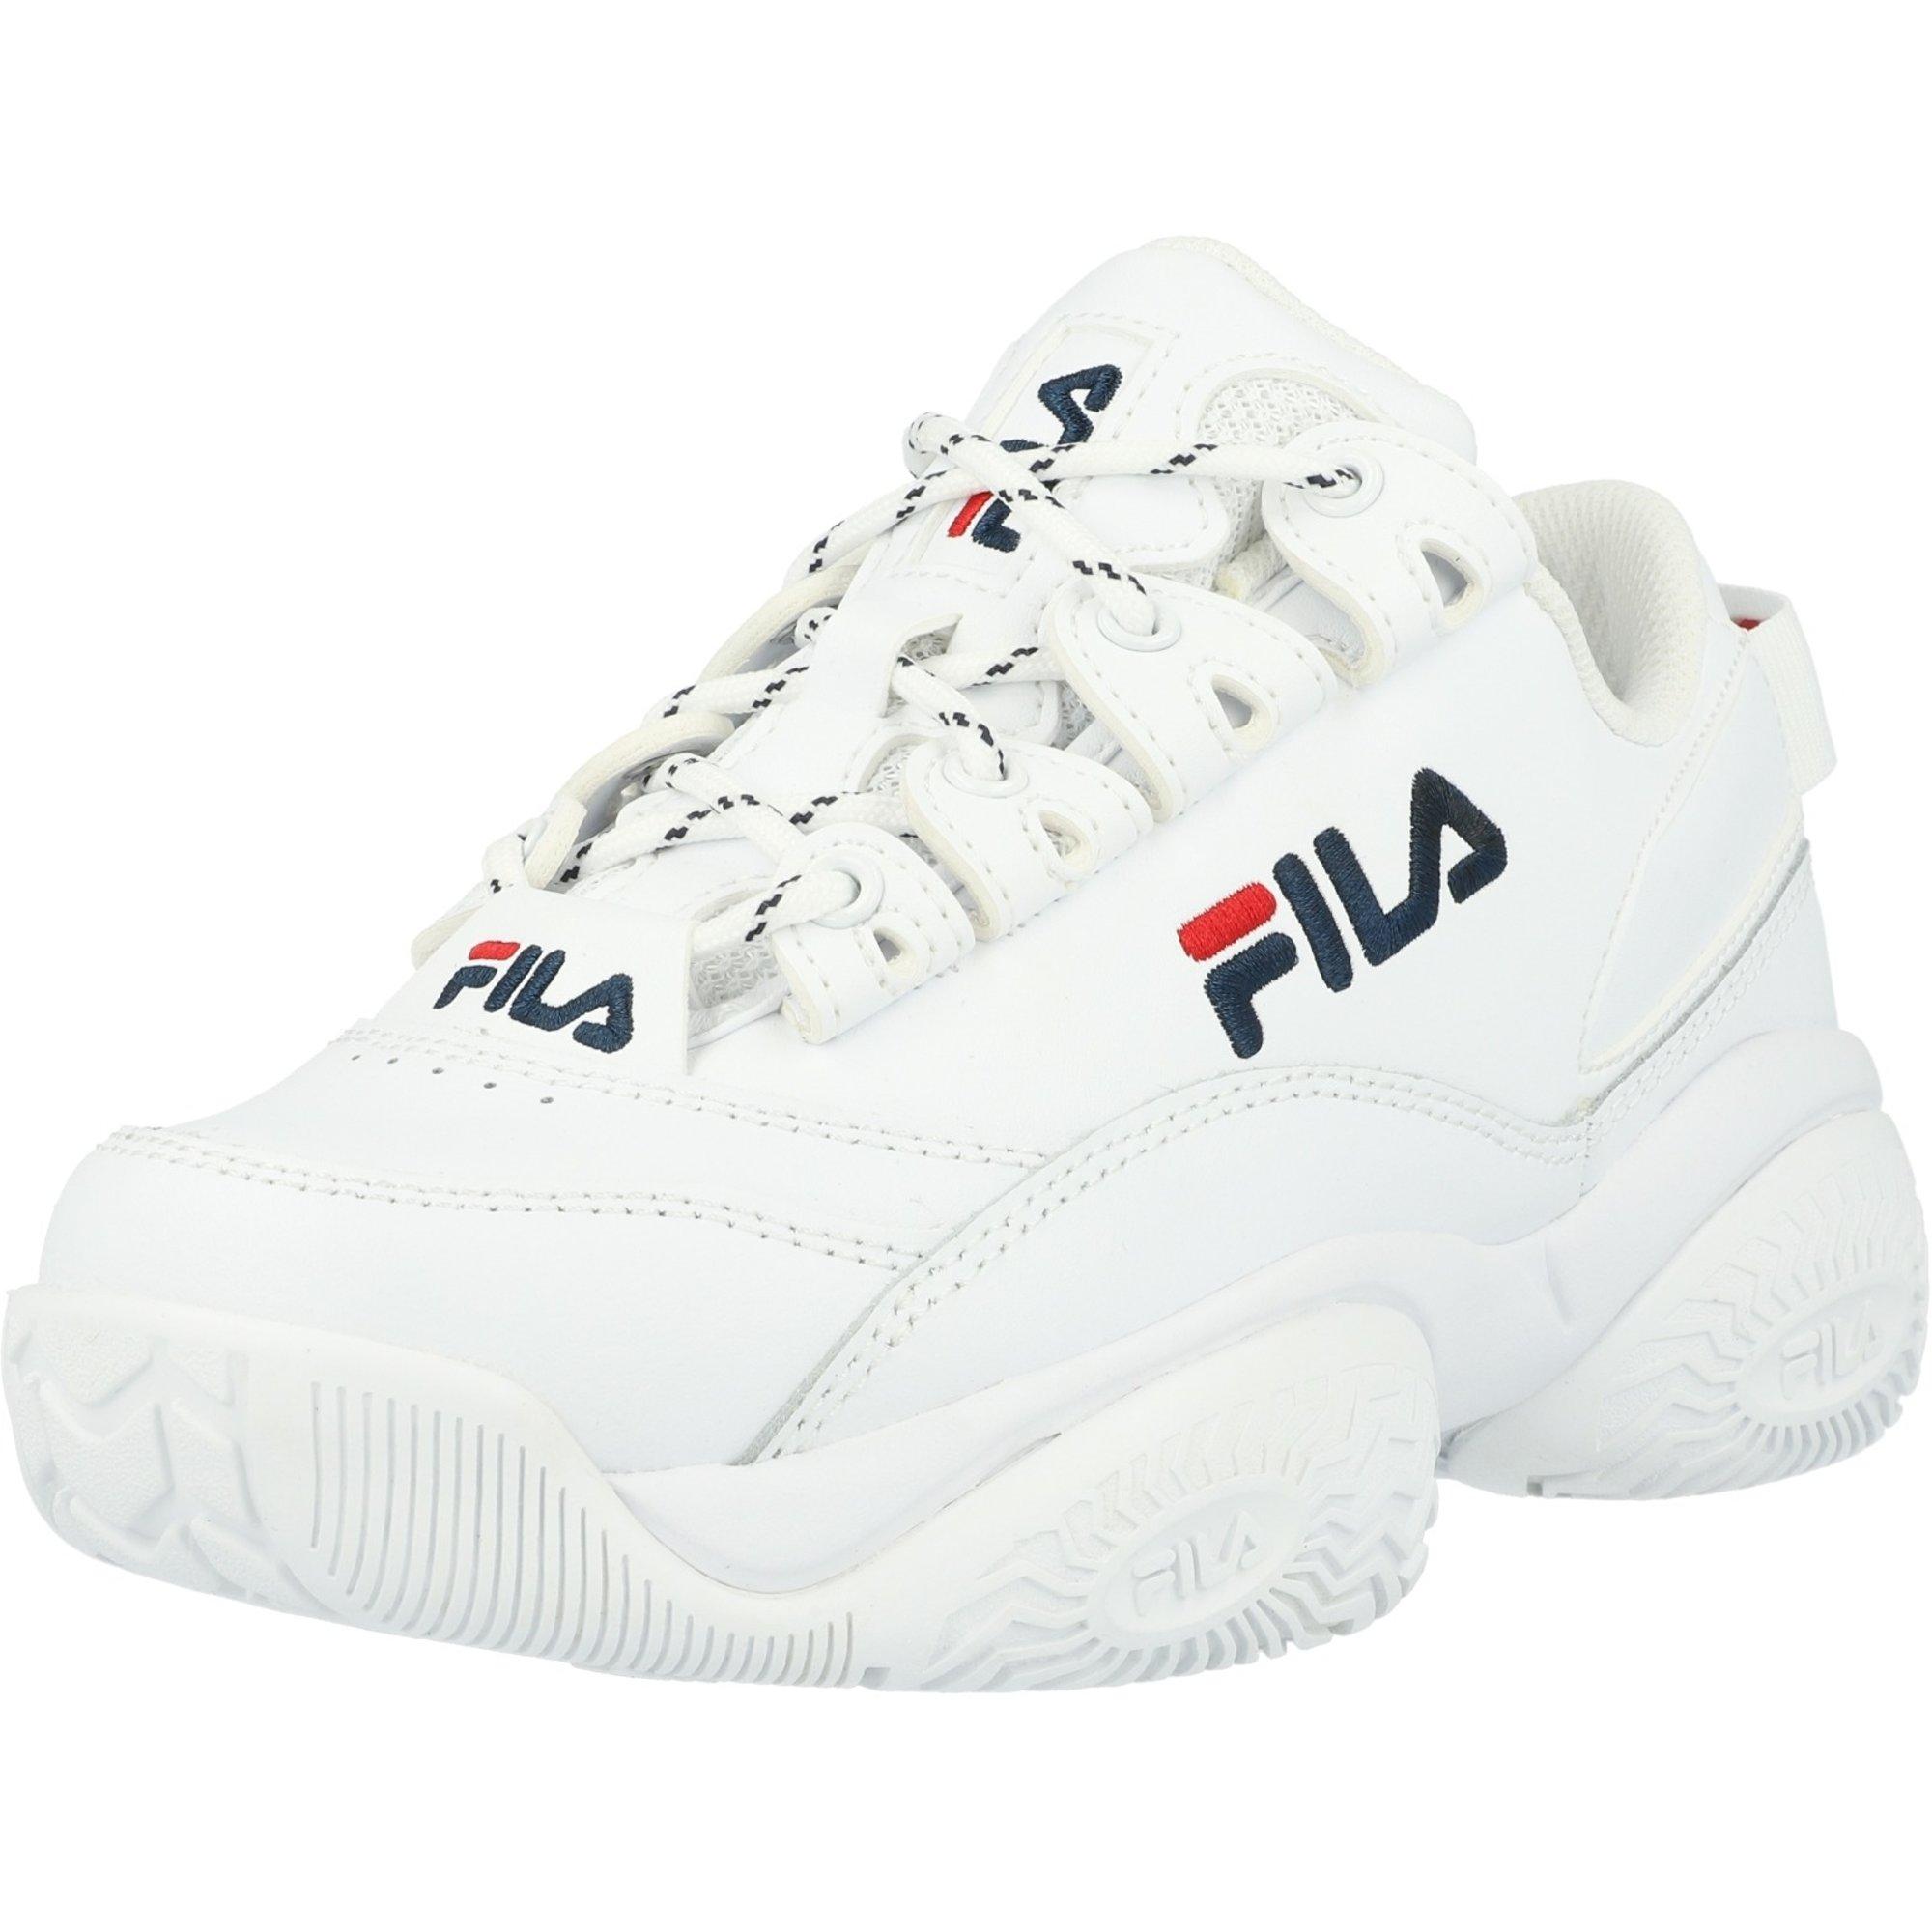 FILA Provenance White/Fila Navy Suede